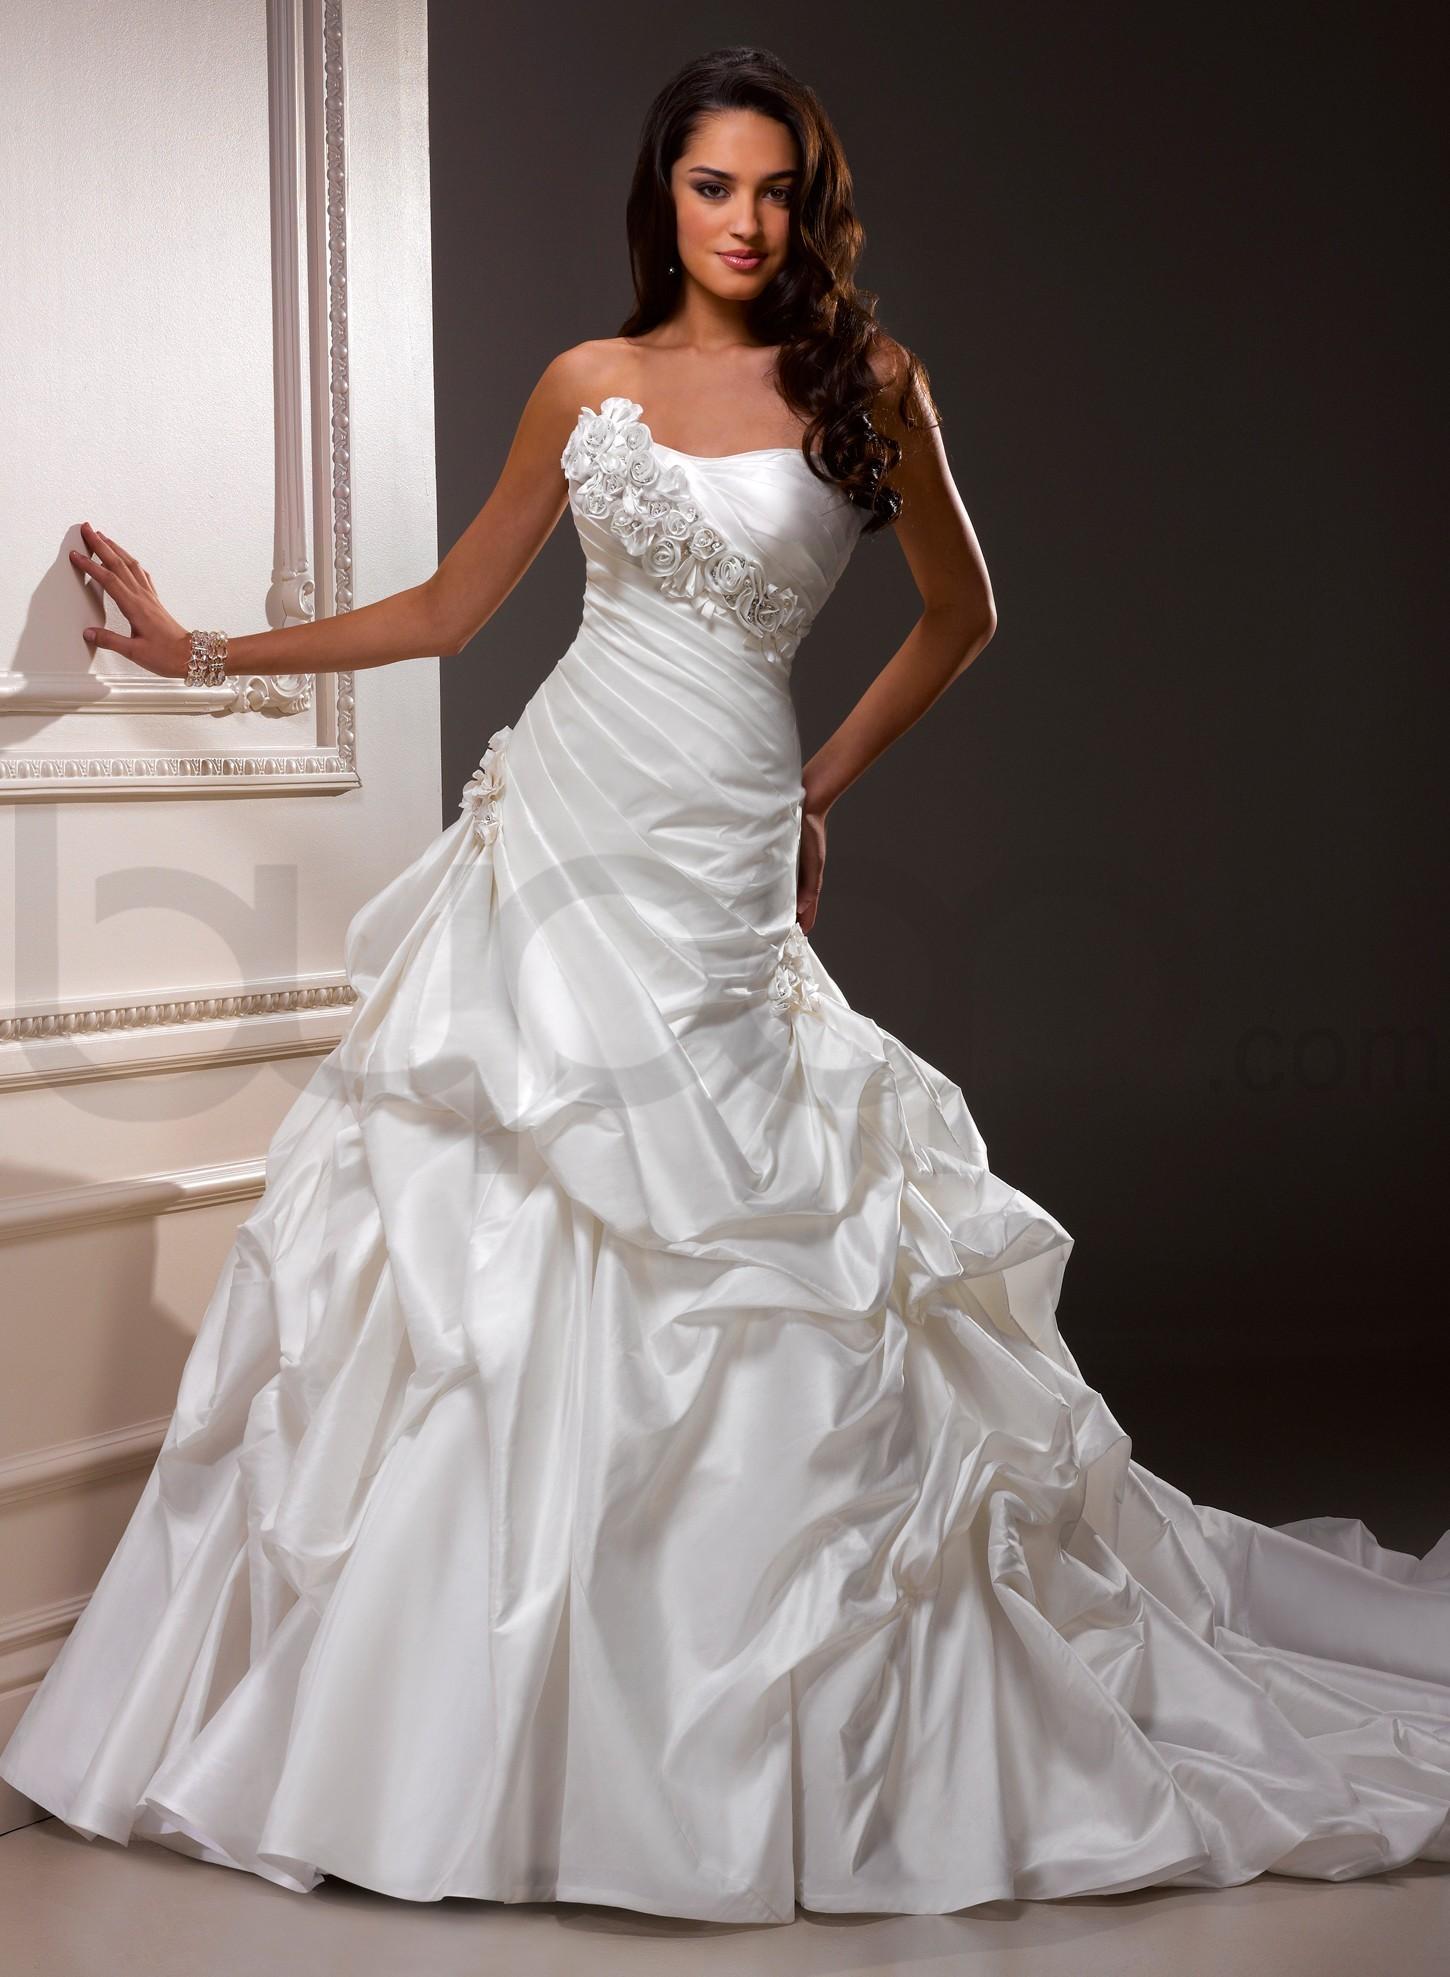 Lovelle taffeta scoop neckline a line wedding dress chez vous lovelle taffeta scoop neckline a line wedding dress junglespirit Gallery